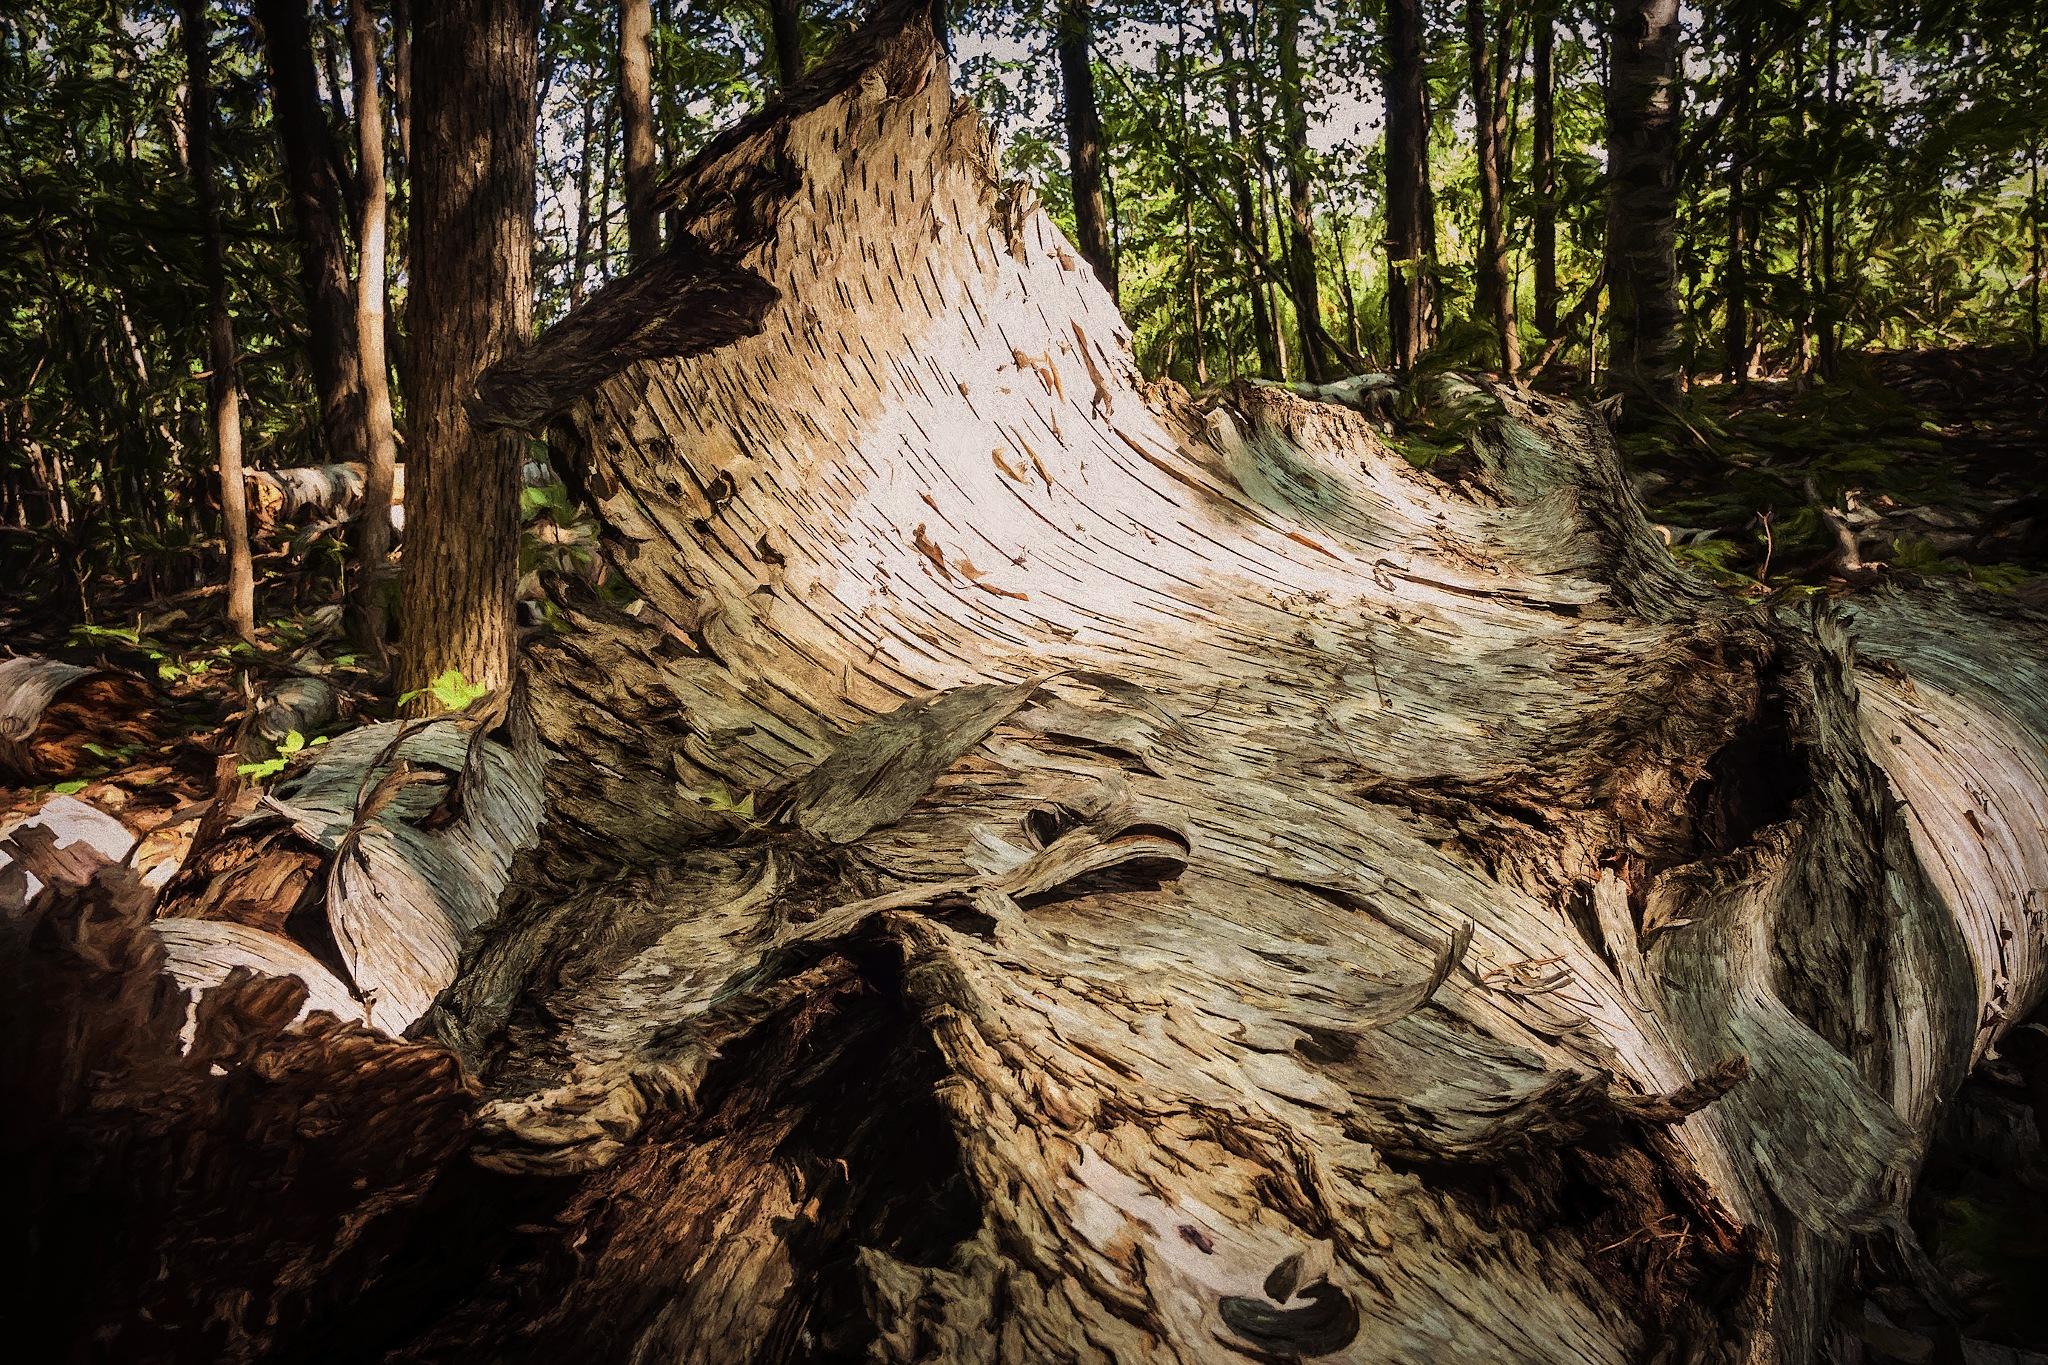 Death Of A Birch by Kevin Hancey